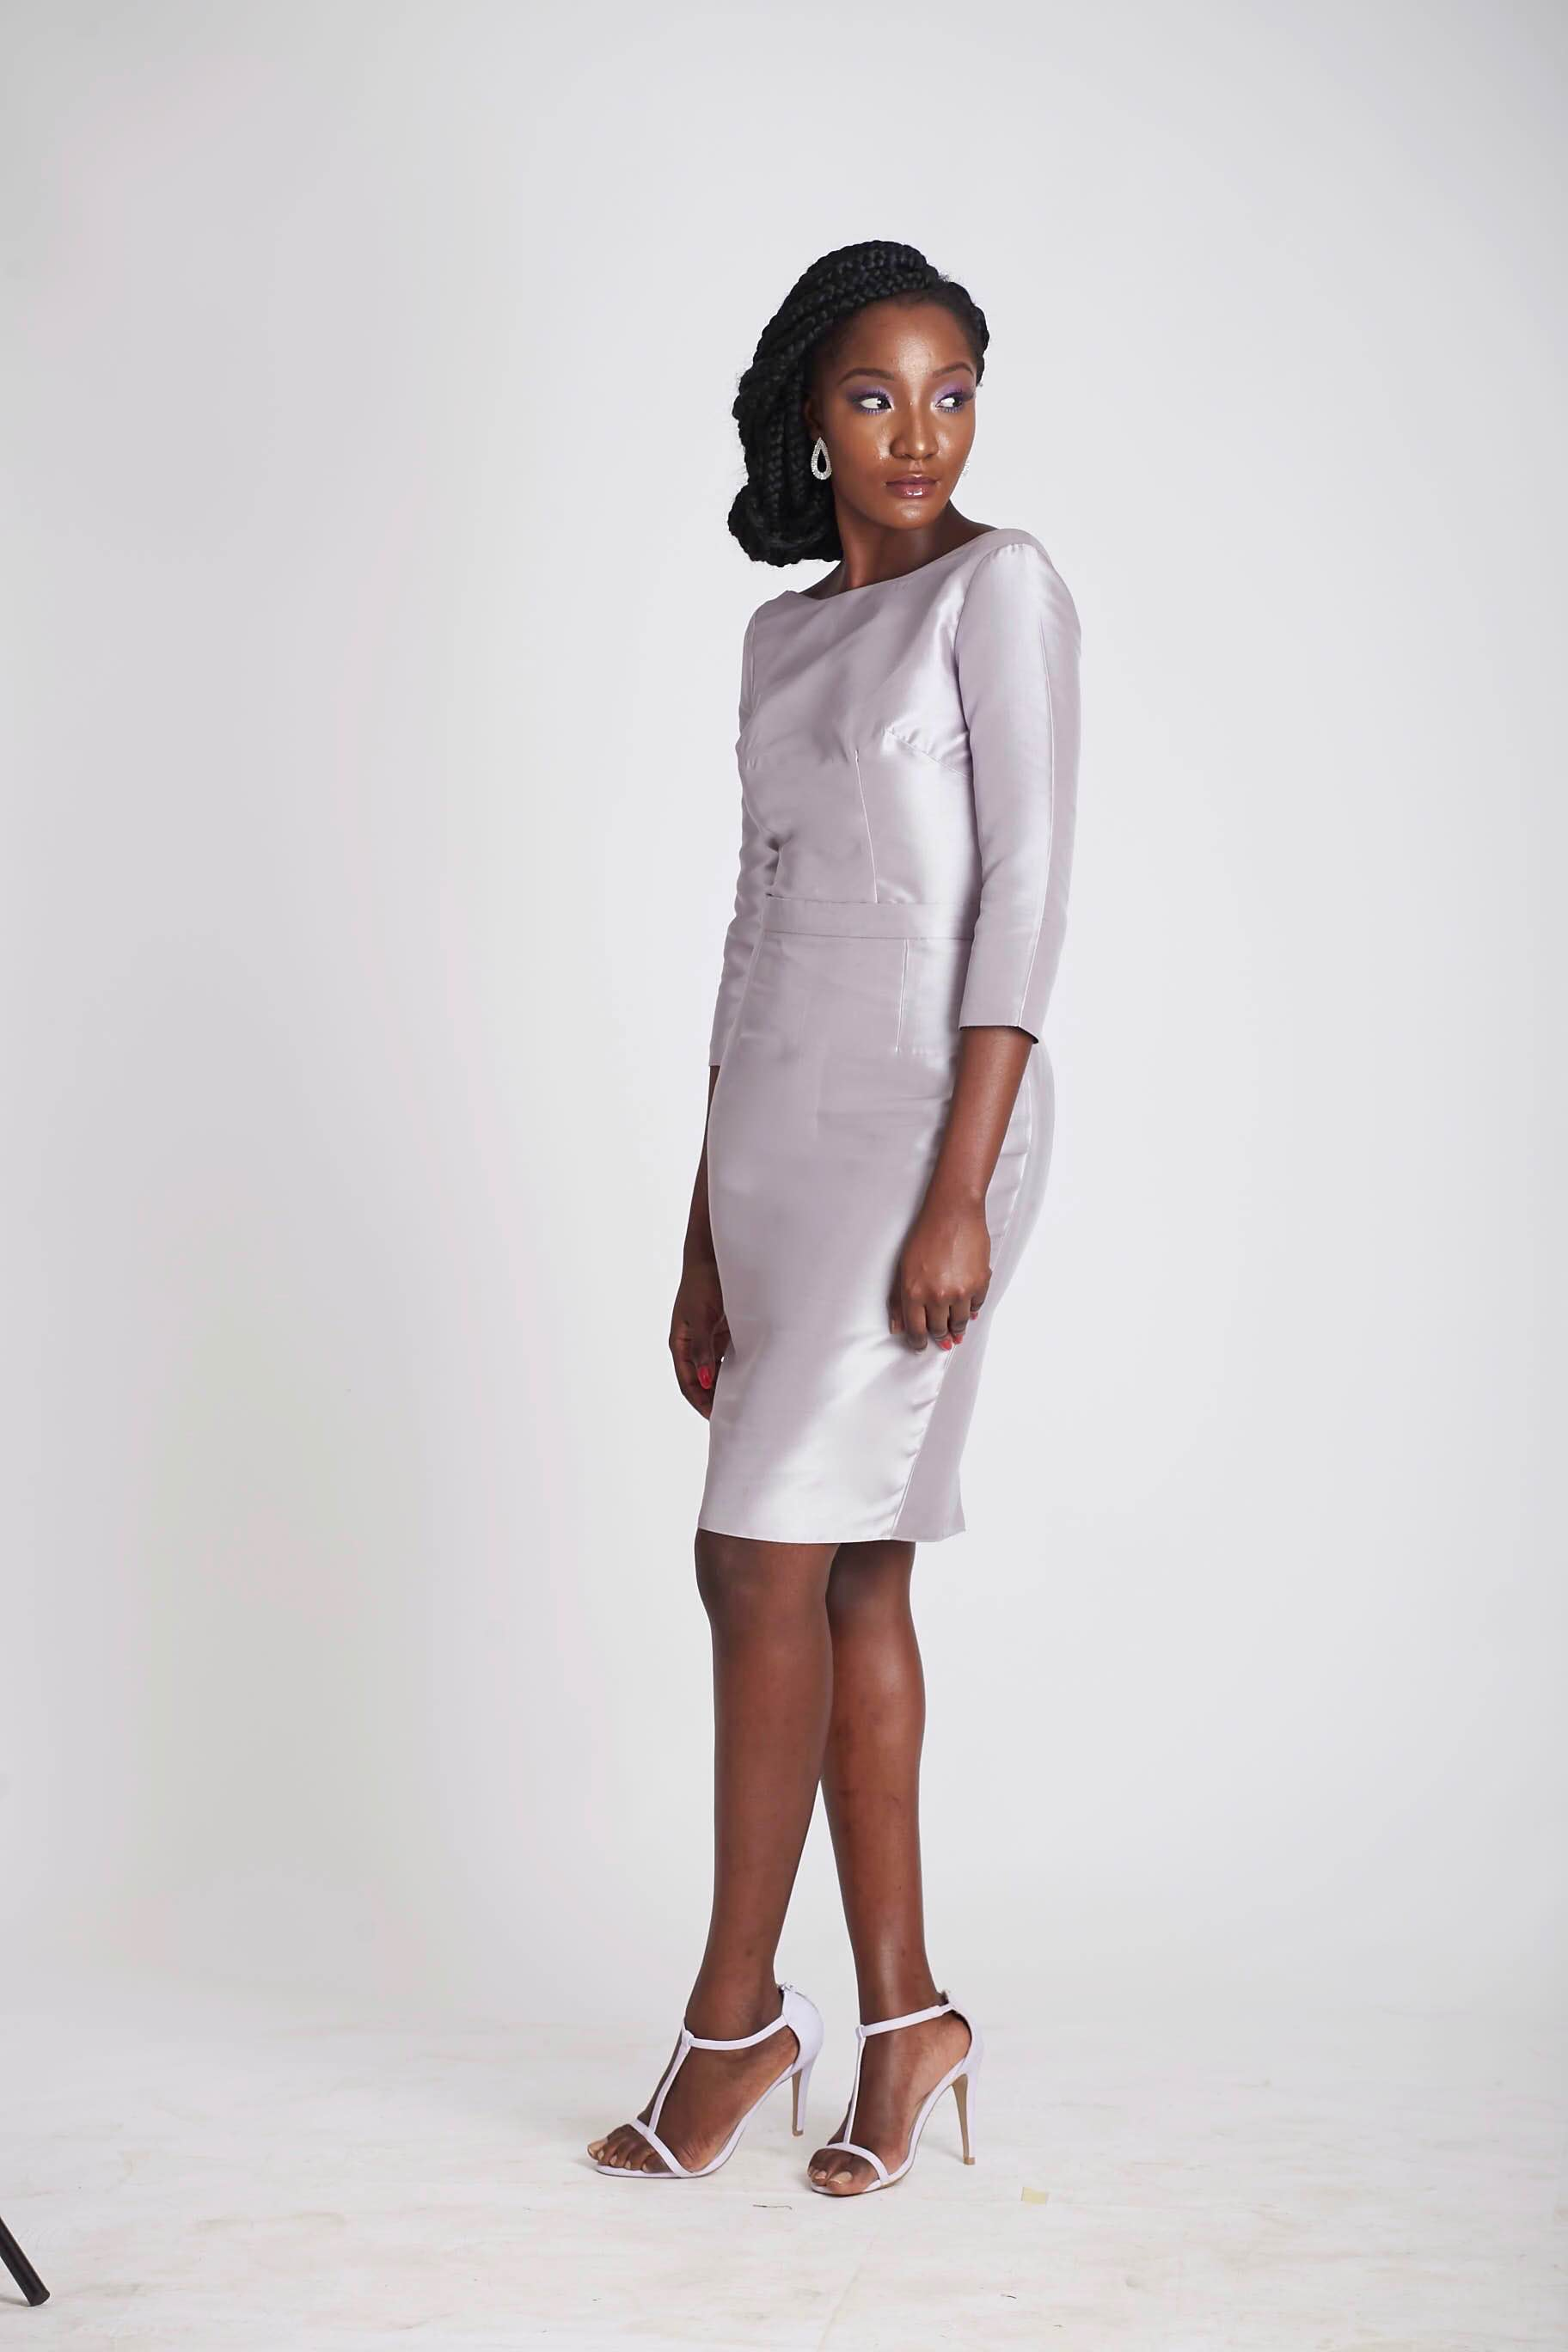 Imad Eduso - BN Style - Collection Lookbook - BellaNaija.com 029